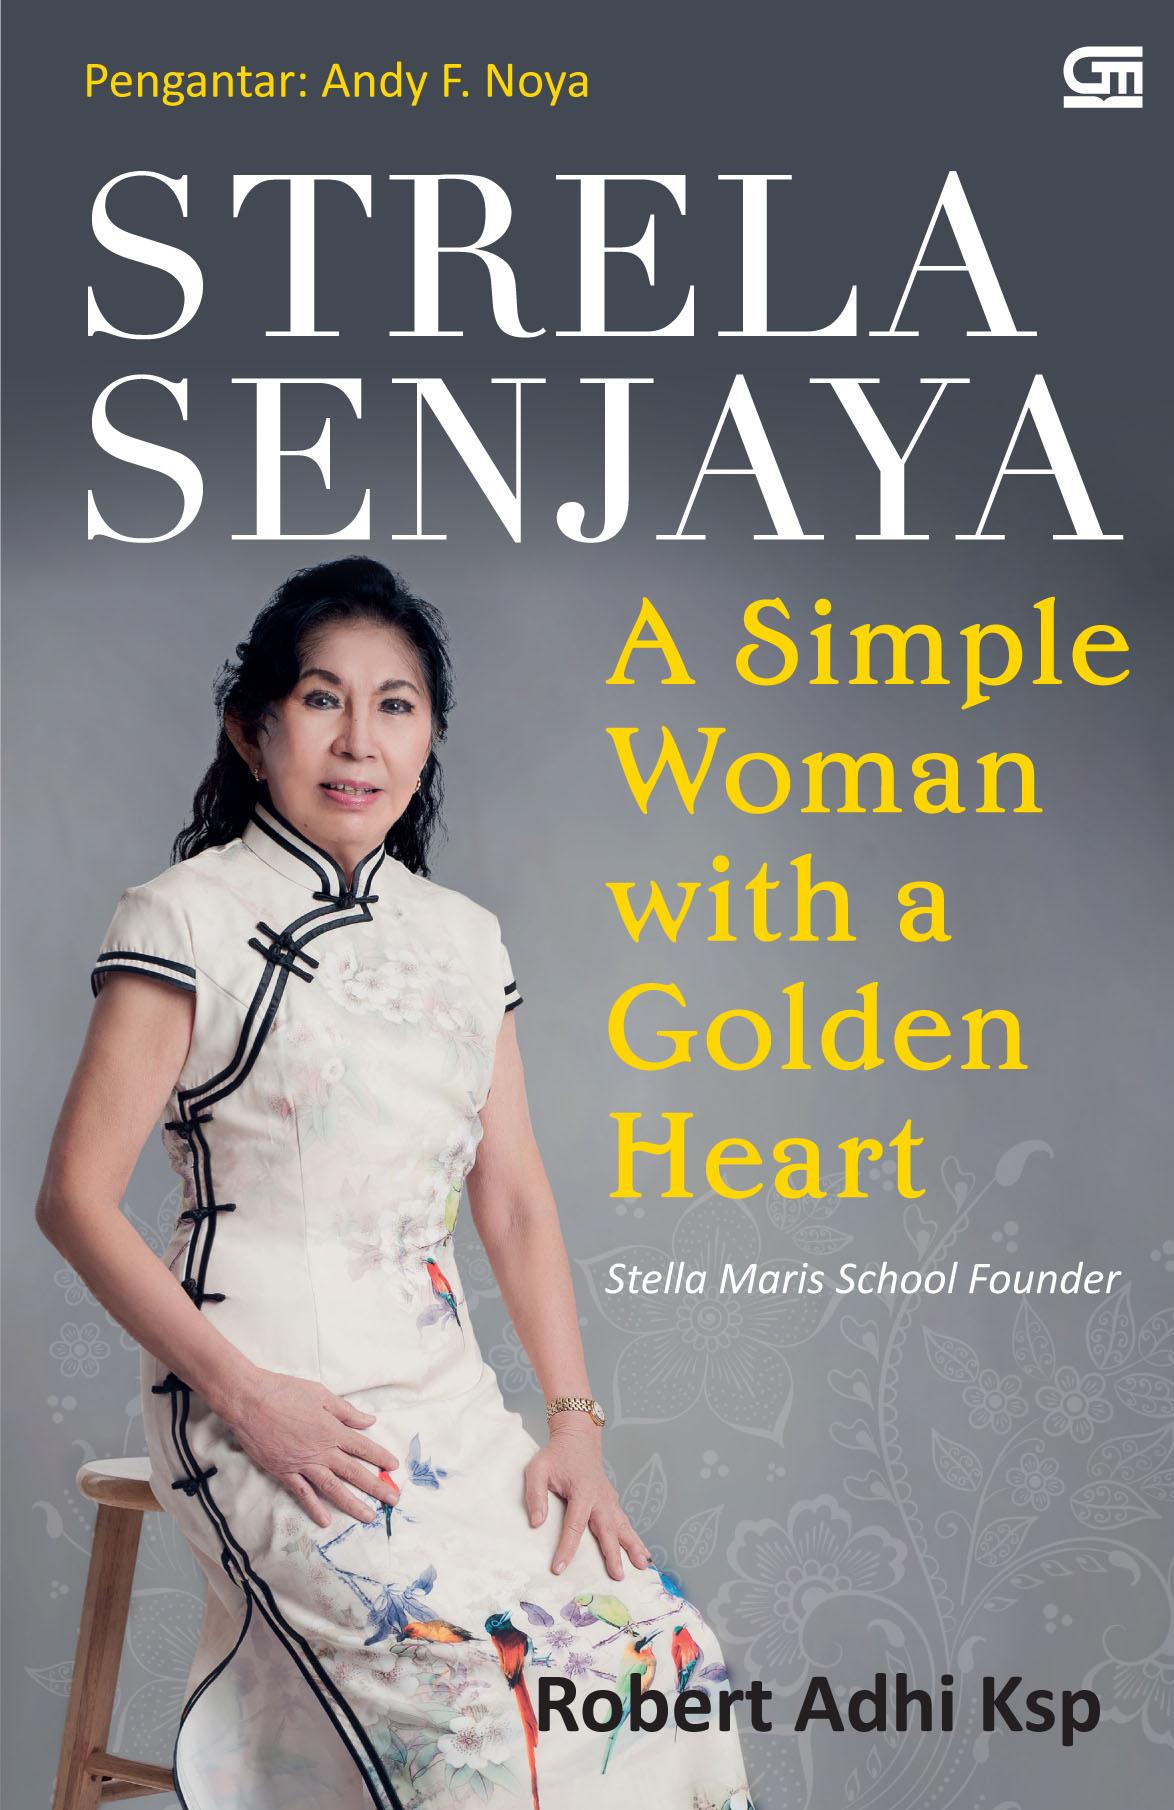 Strela Senjaya: A Simple Woman With A Golden Heart